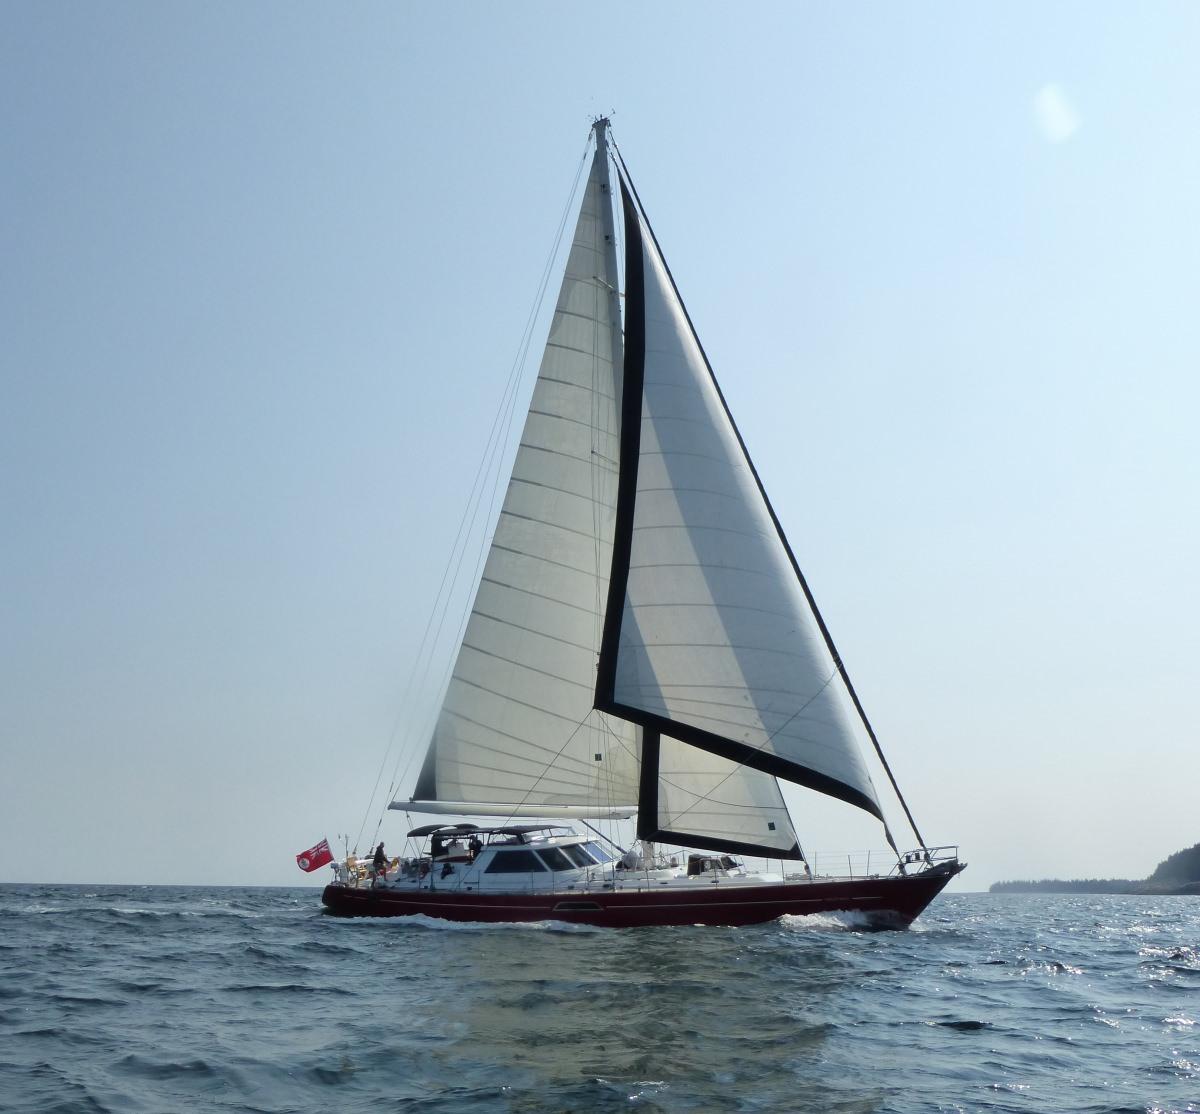 MUSTANG Under Full Sail